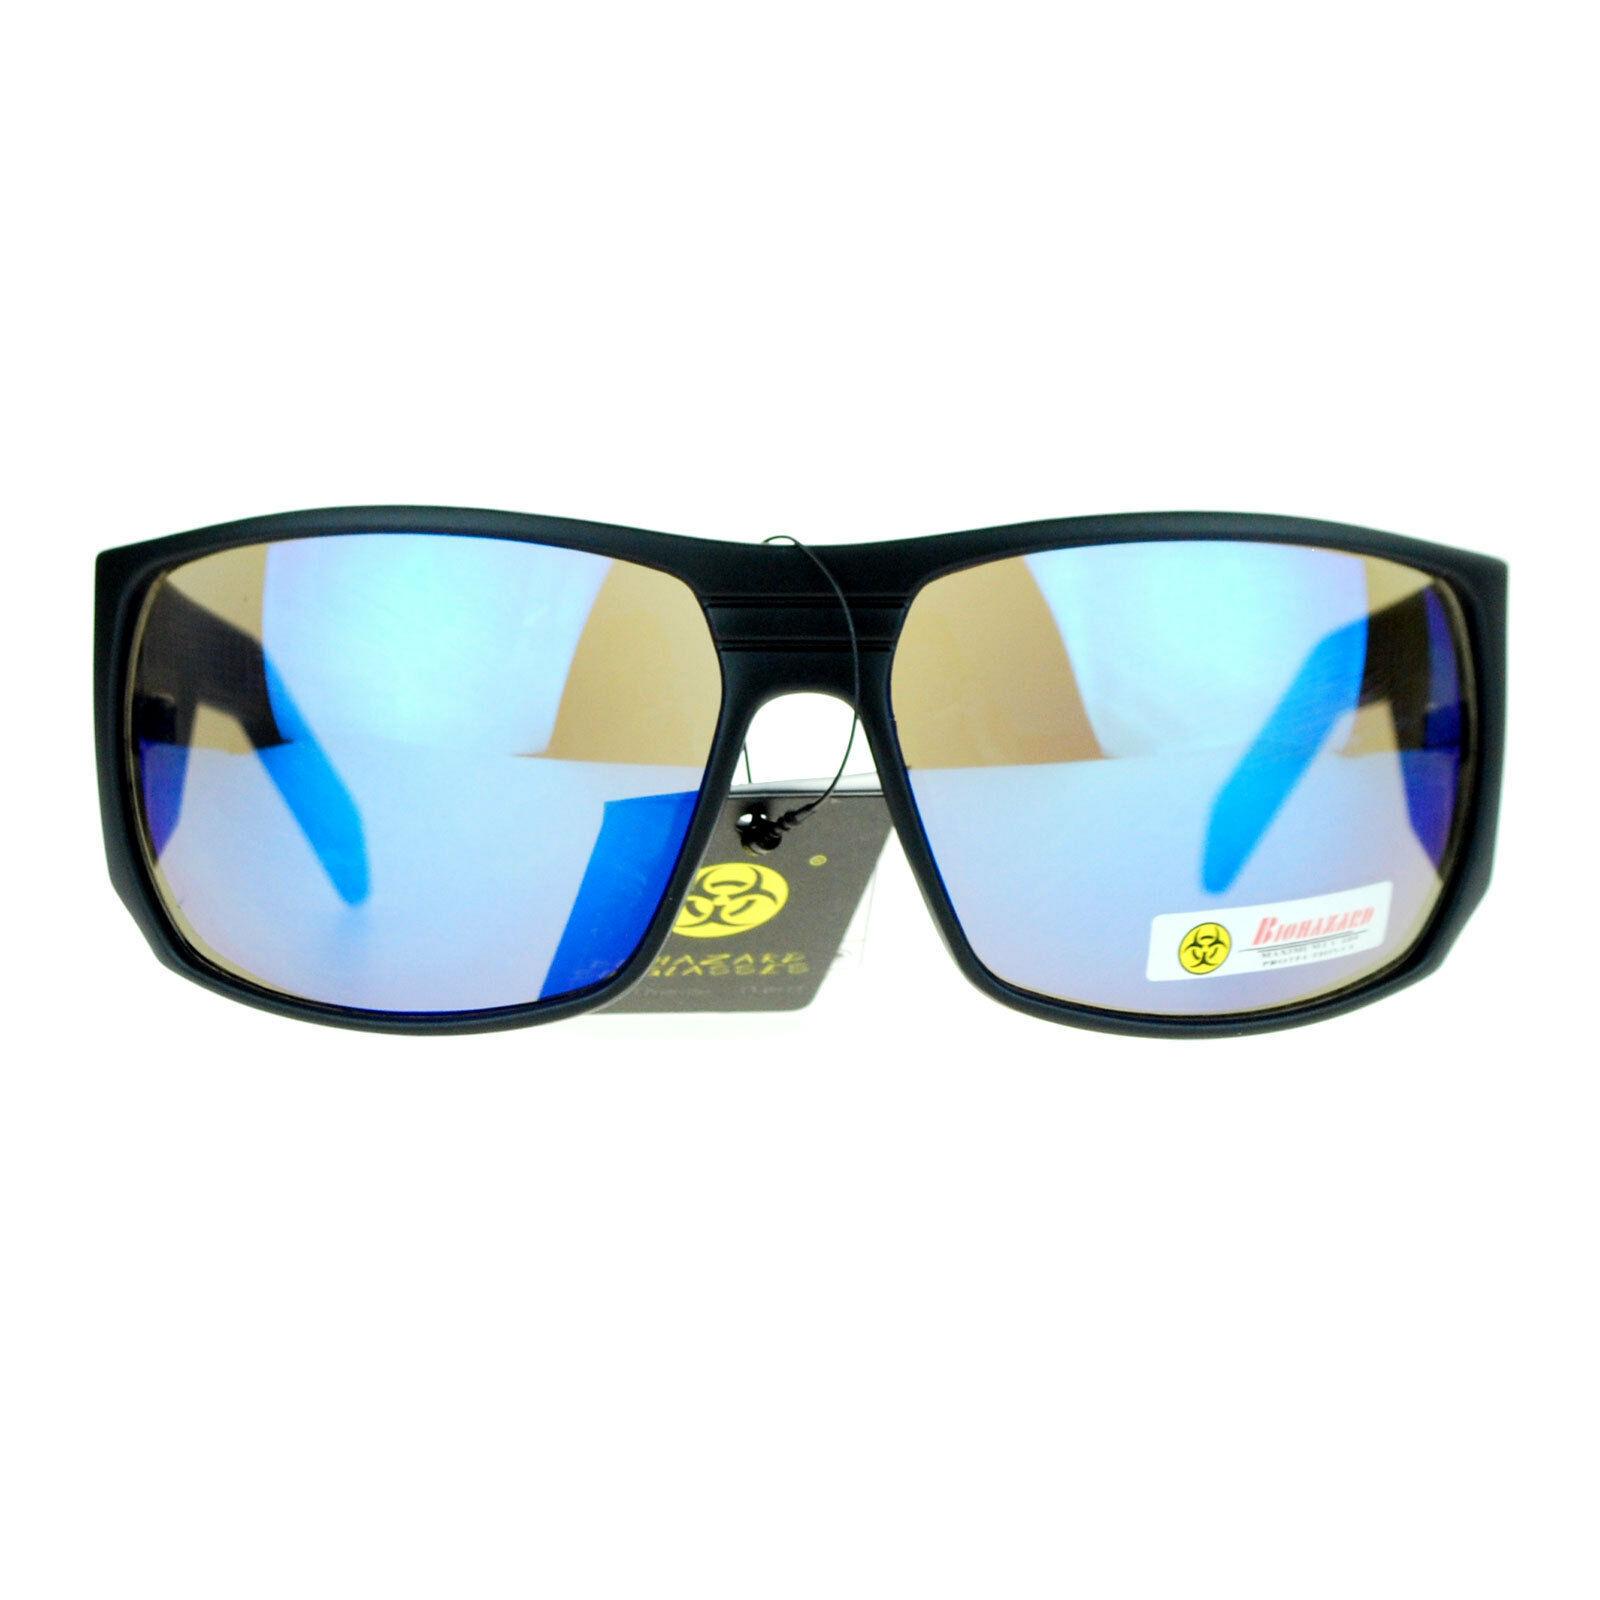 Biohazard Mens Fashion Sunglasses Oversized Thick Rectangular Frame